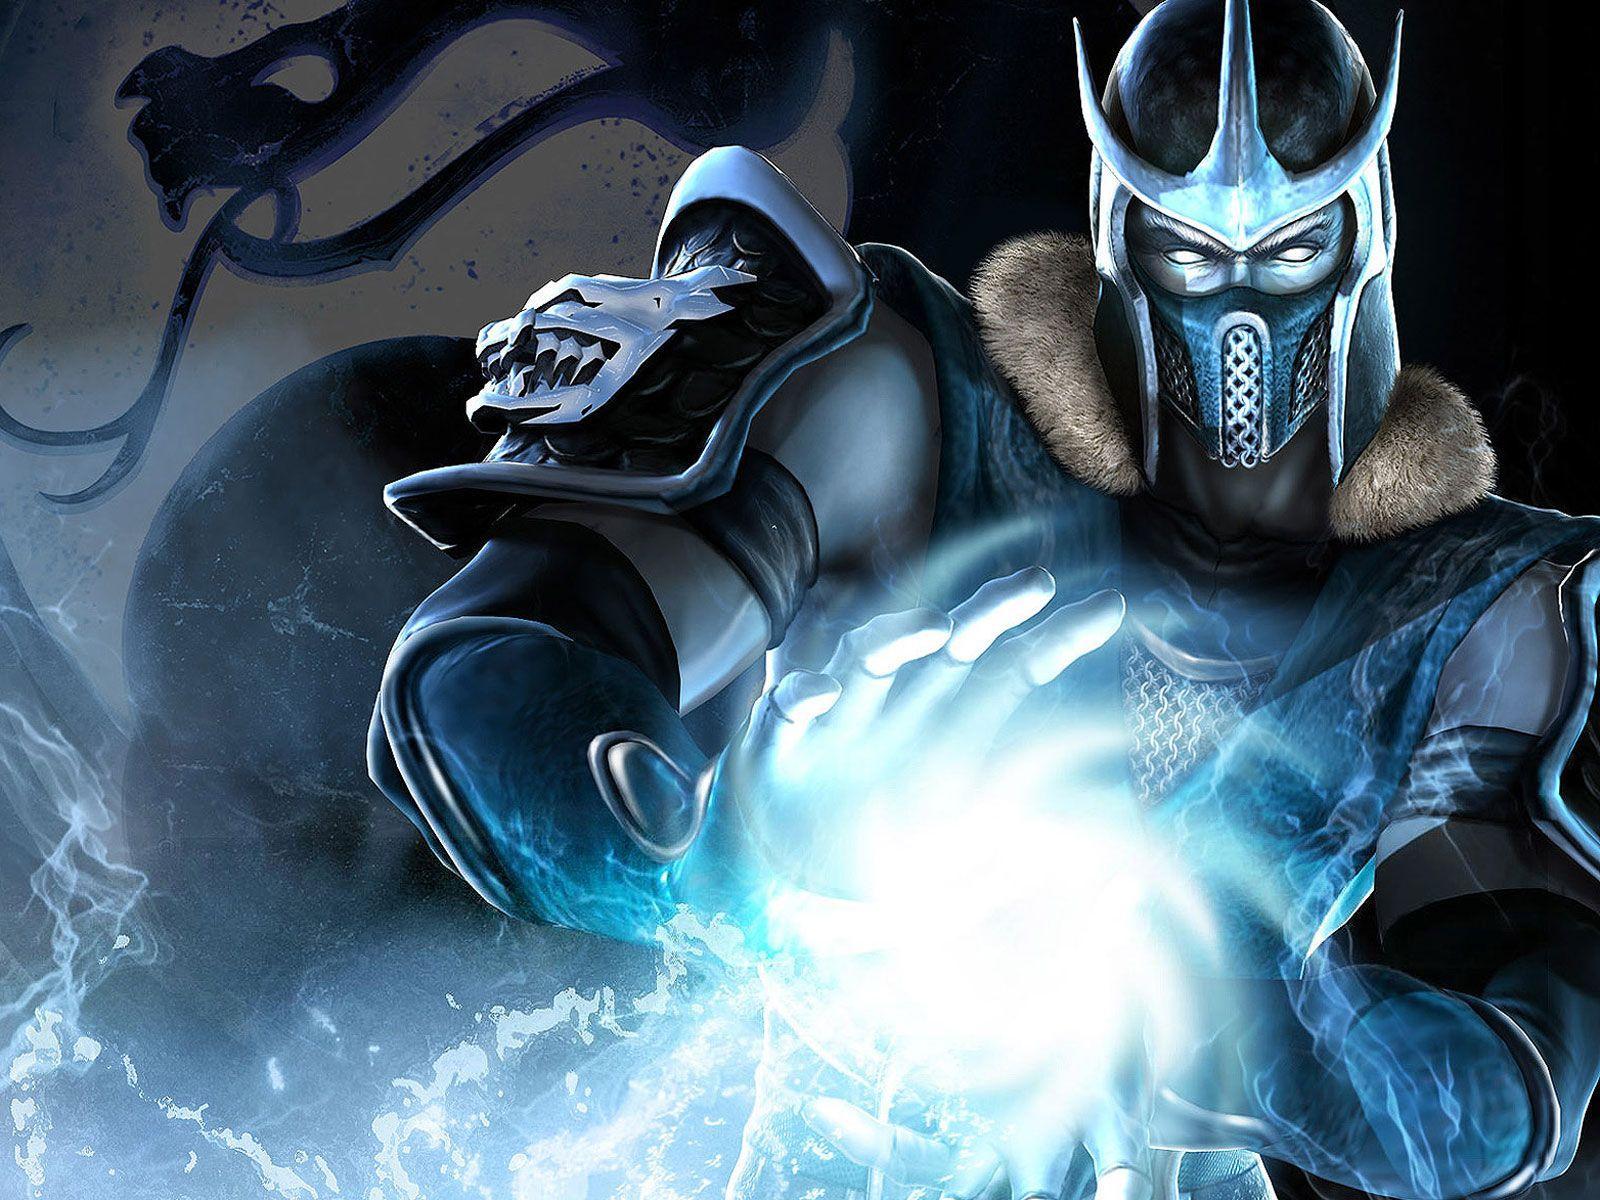 Mortal Kombat Deception Wallpapers Top Free Mortal Kombat